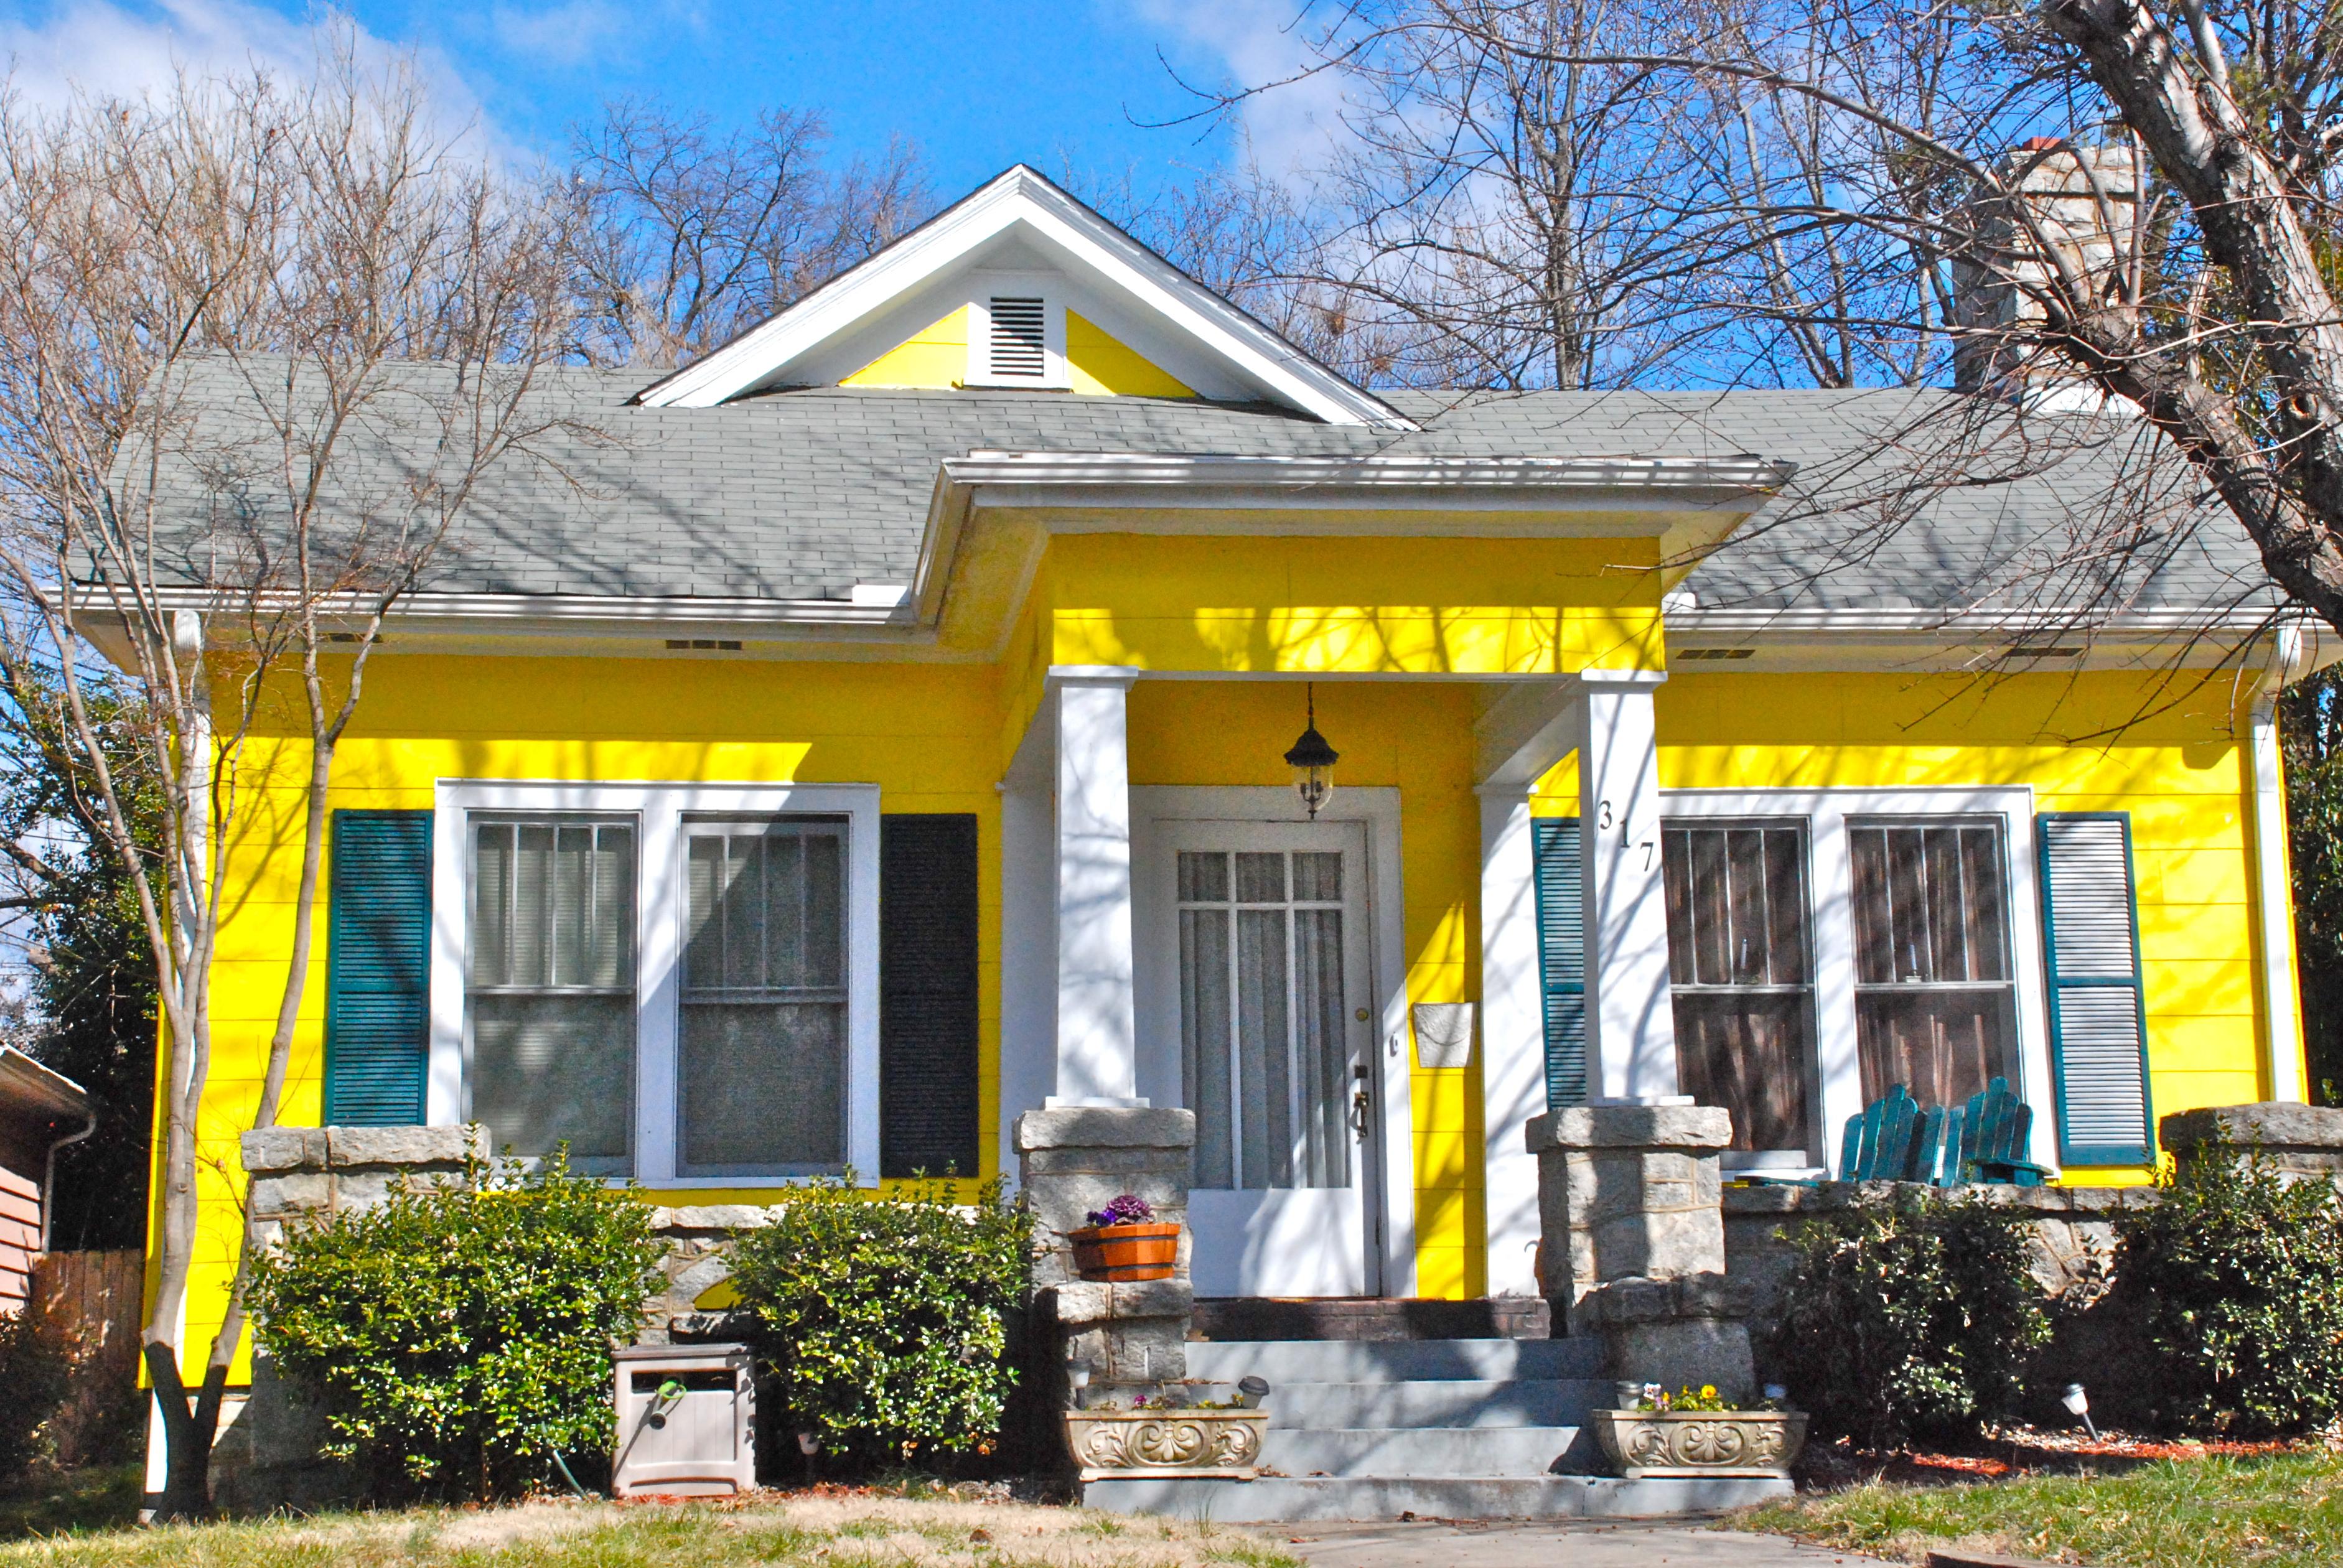 Houses of the Rainbow Lemon Yellow Greensboro Daily